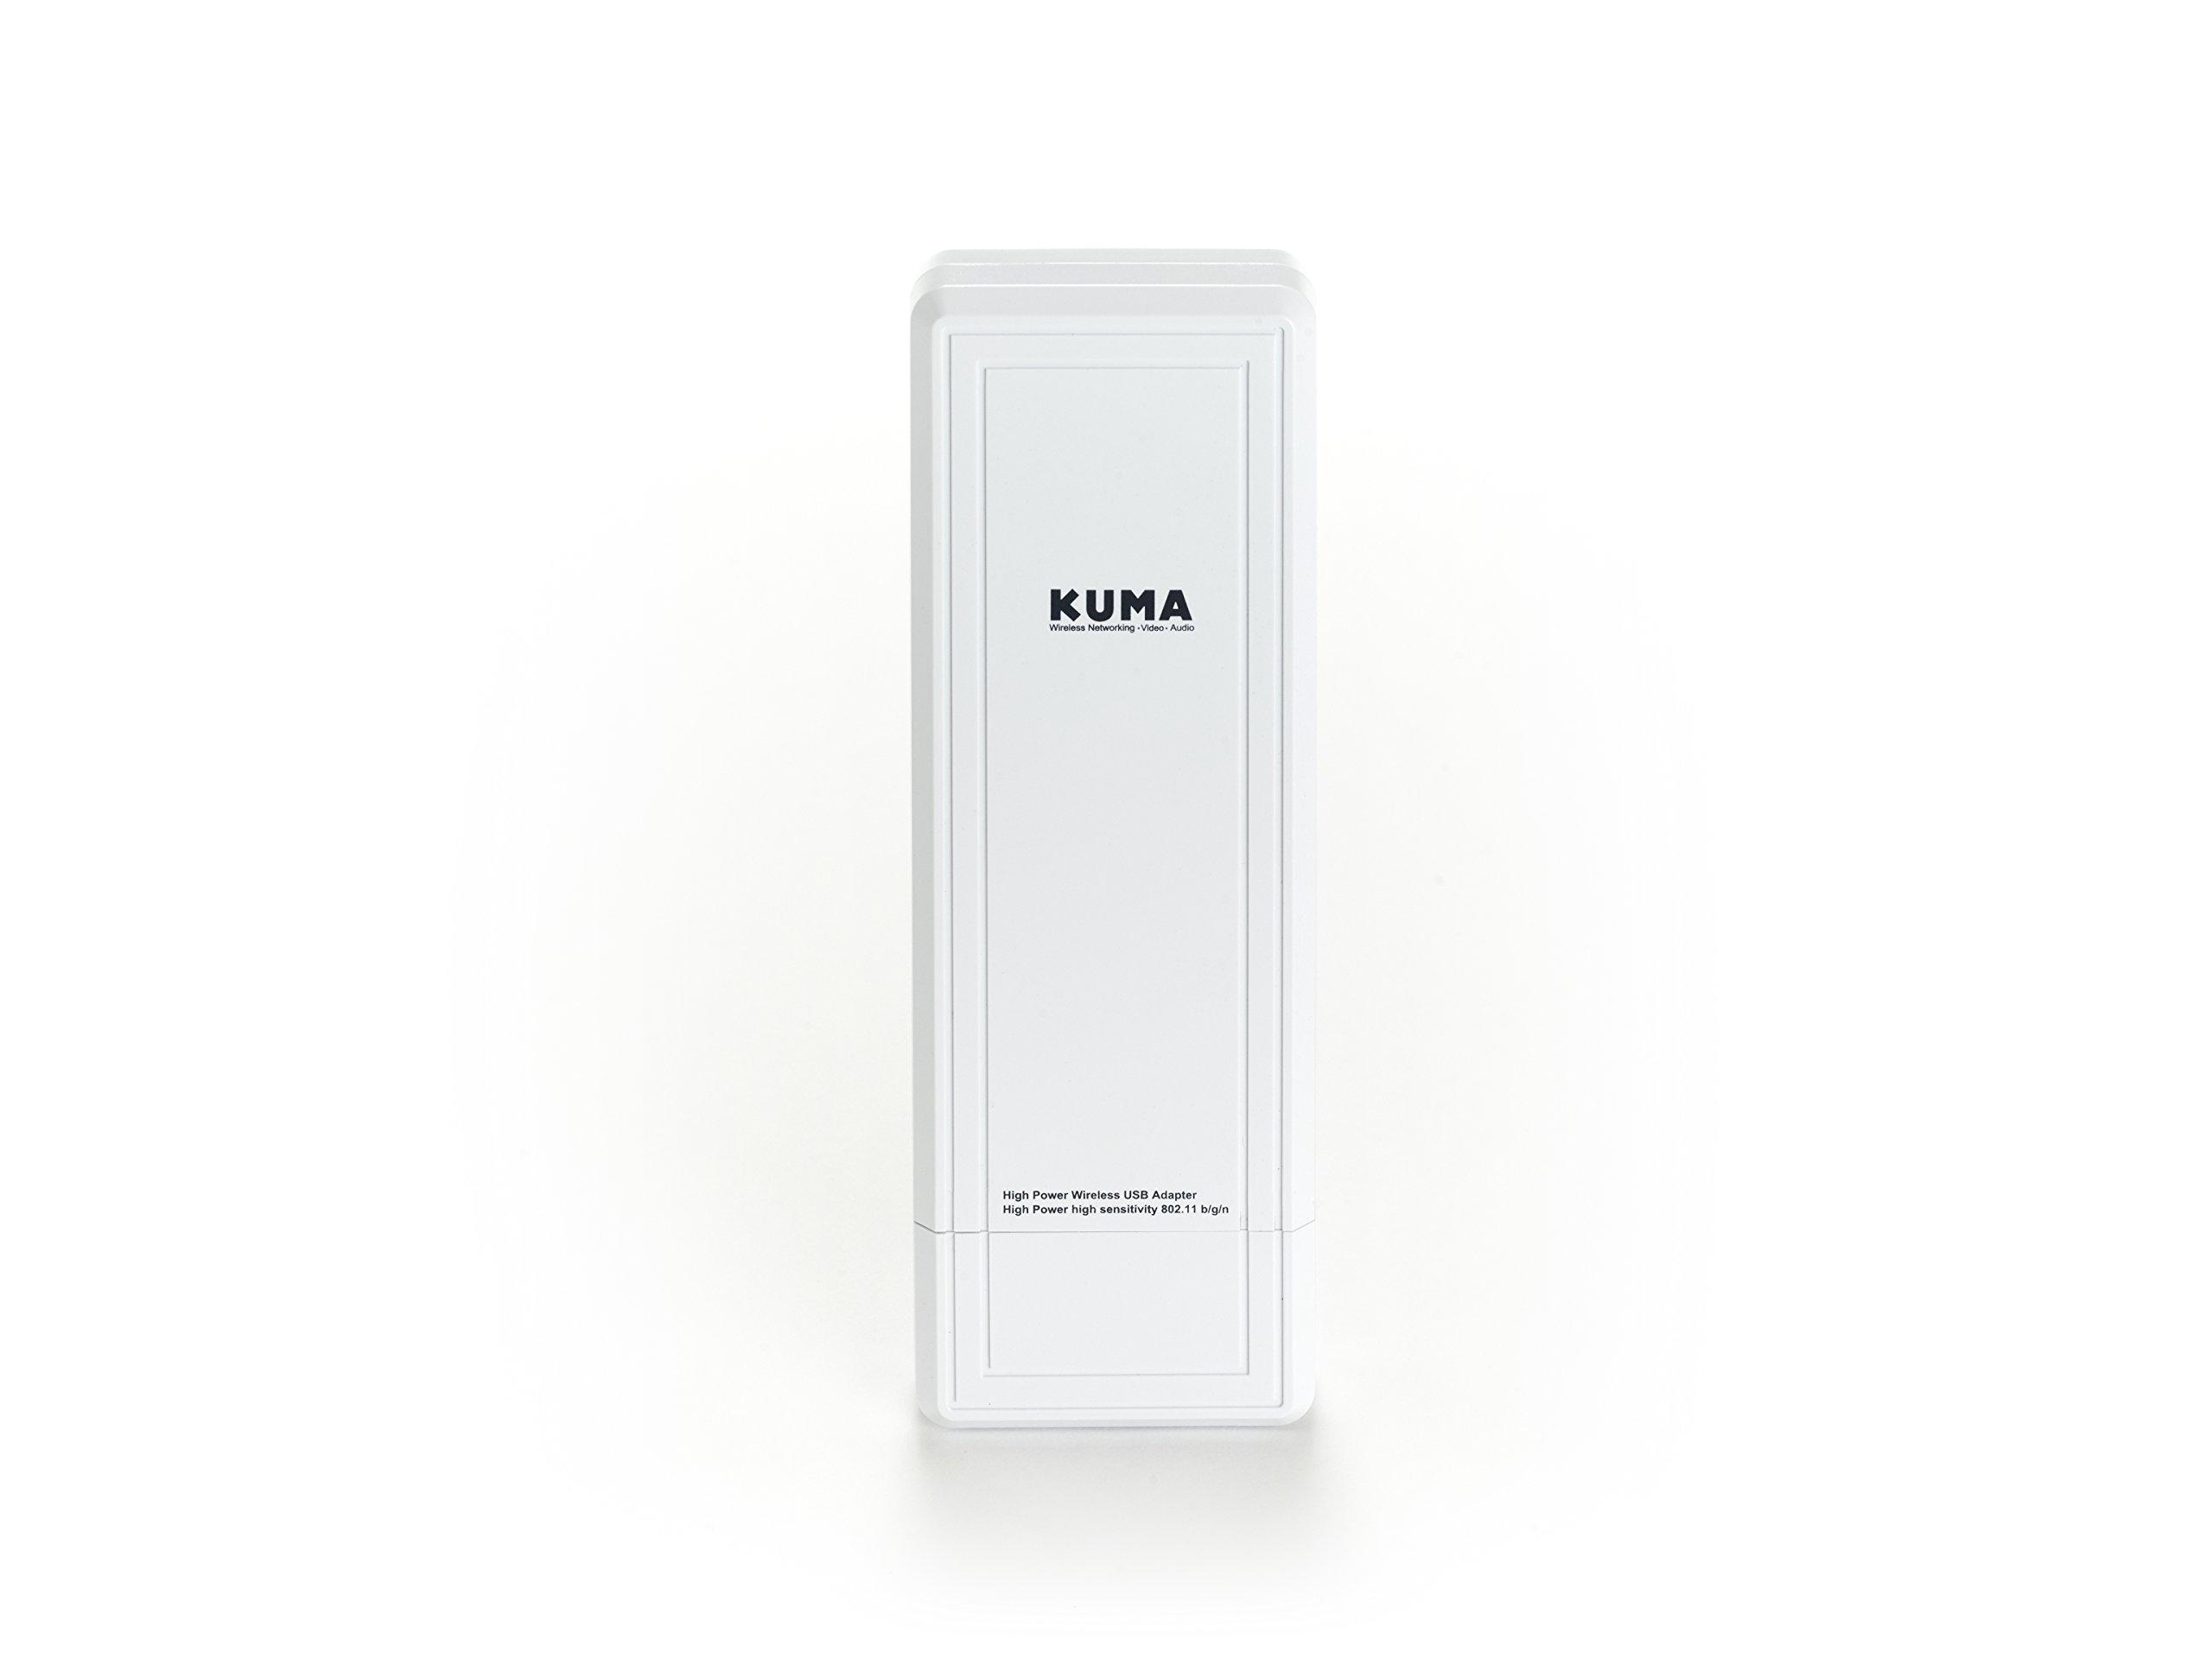 Kuma Hi-Gain Long Range Wireless Wifi Signal Booster Extender Hotspot Access Point Network Repeater for RVs, Motorhomes, Trucks & Boats by KUMA (Image #4)